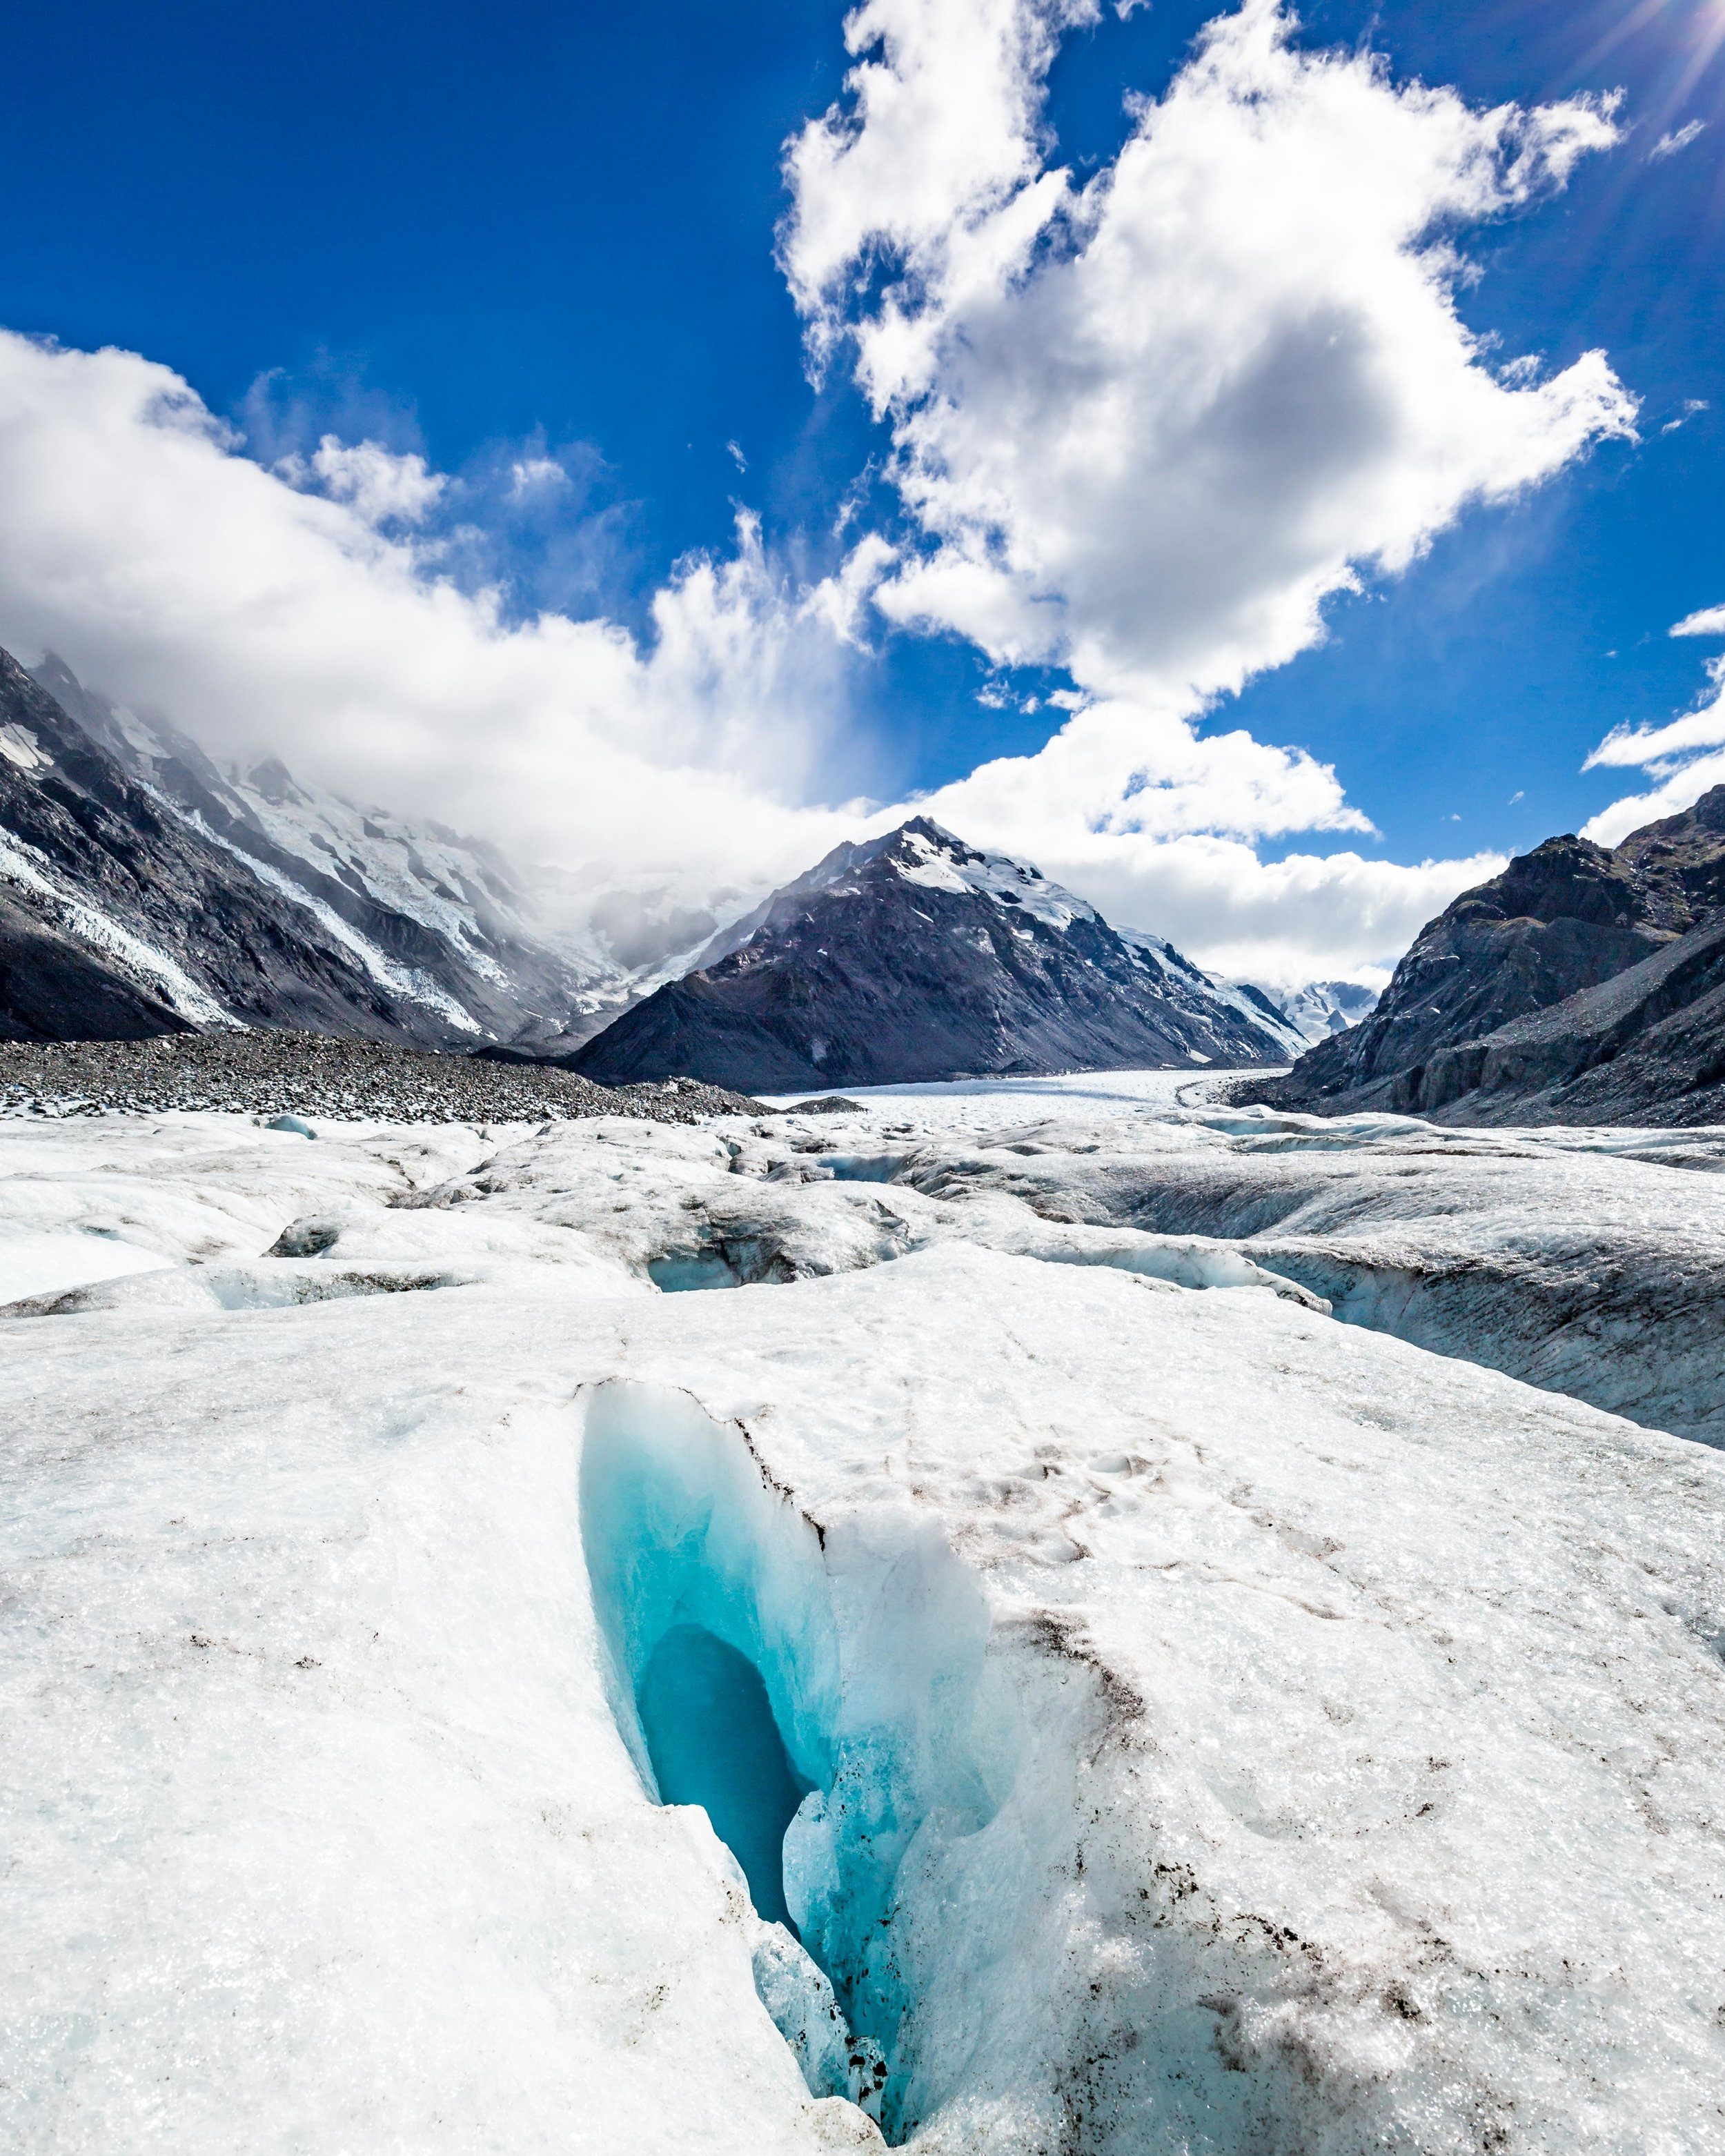 2 week New Zealand South Island Itinerary: Tasman Glacier